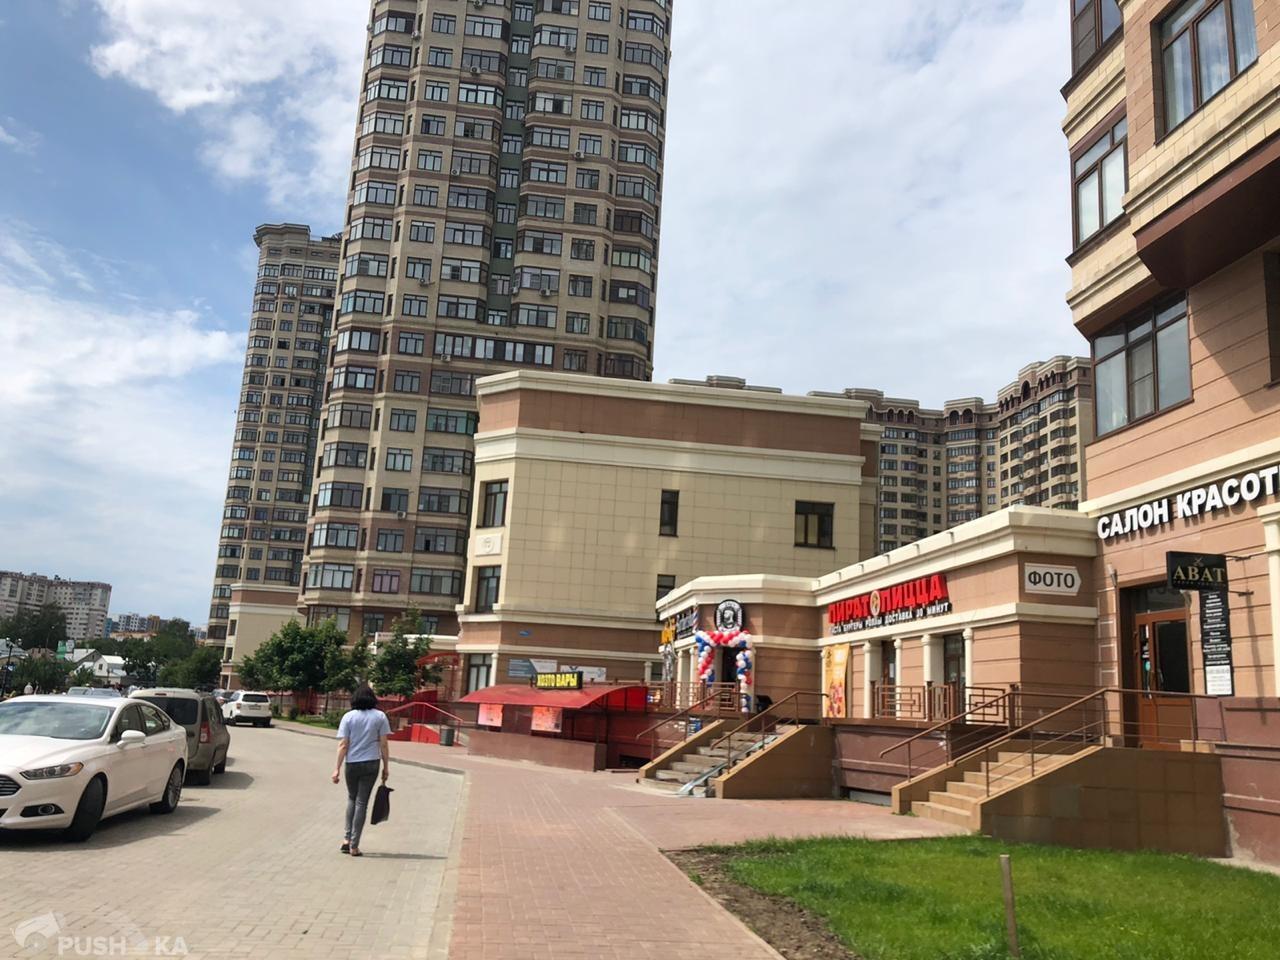 Продаётся 1-комнатная квартира 34.1 кв.м. этаж 3/20 за 2 800 000 руб